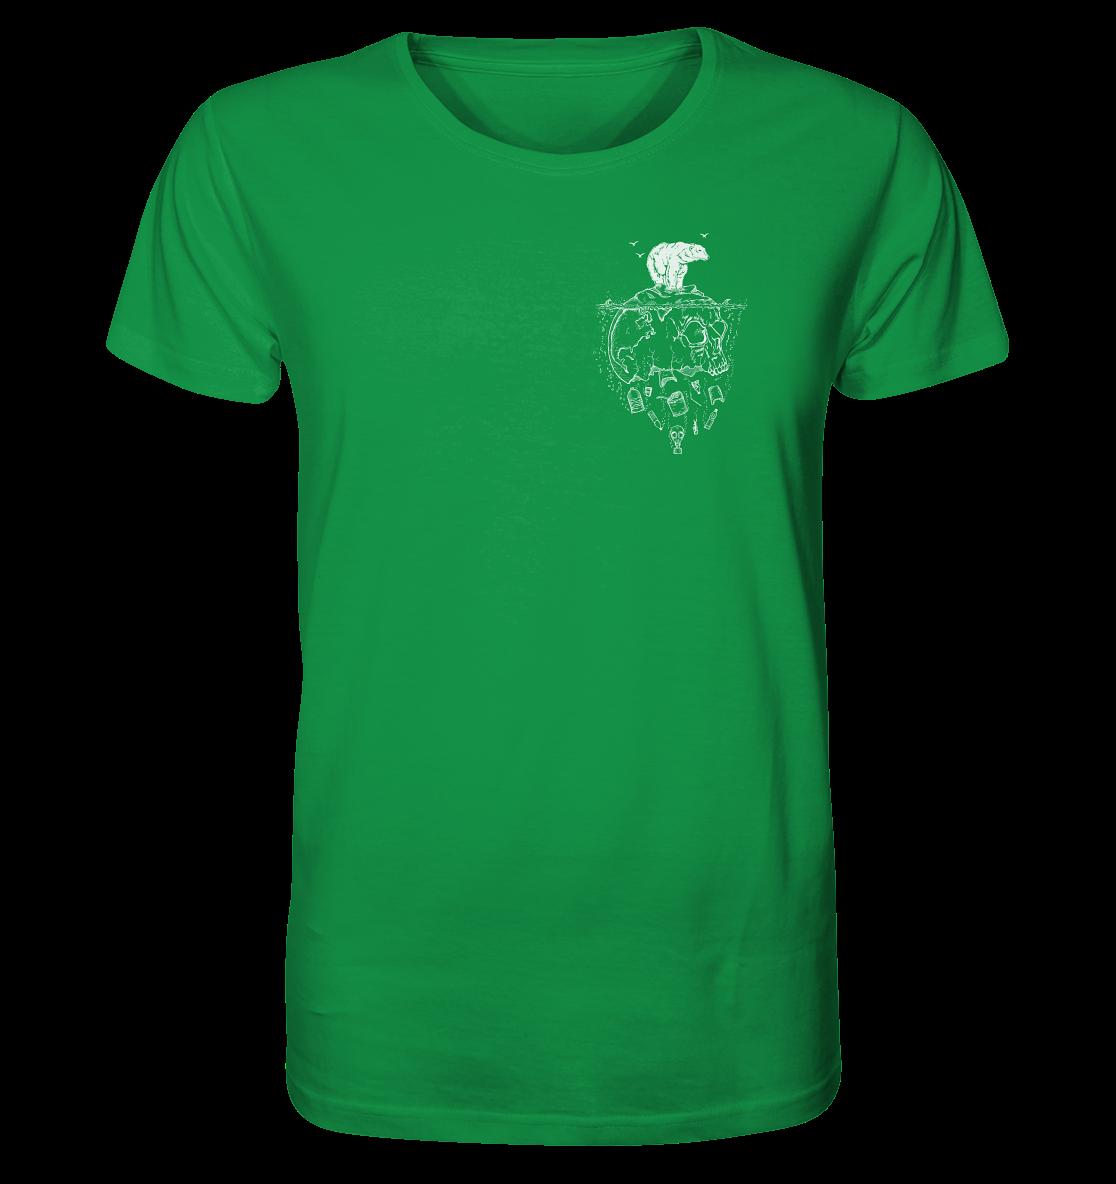 front-organic-shirt-149348-1116x-36.png